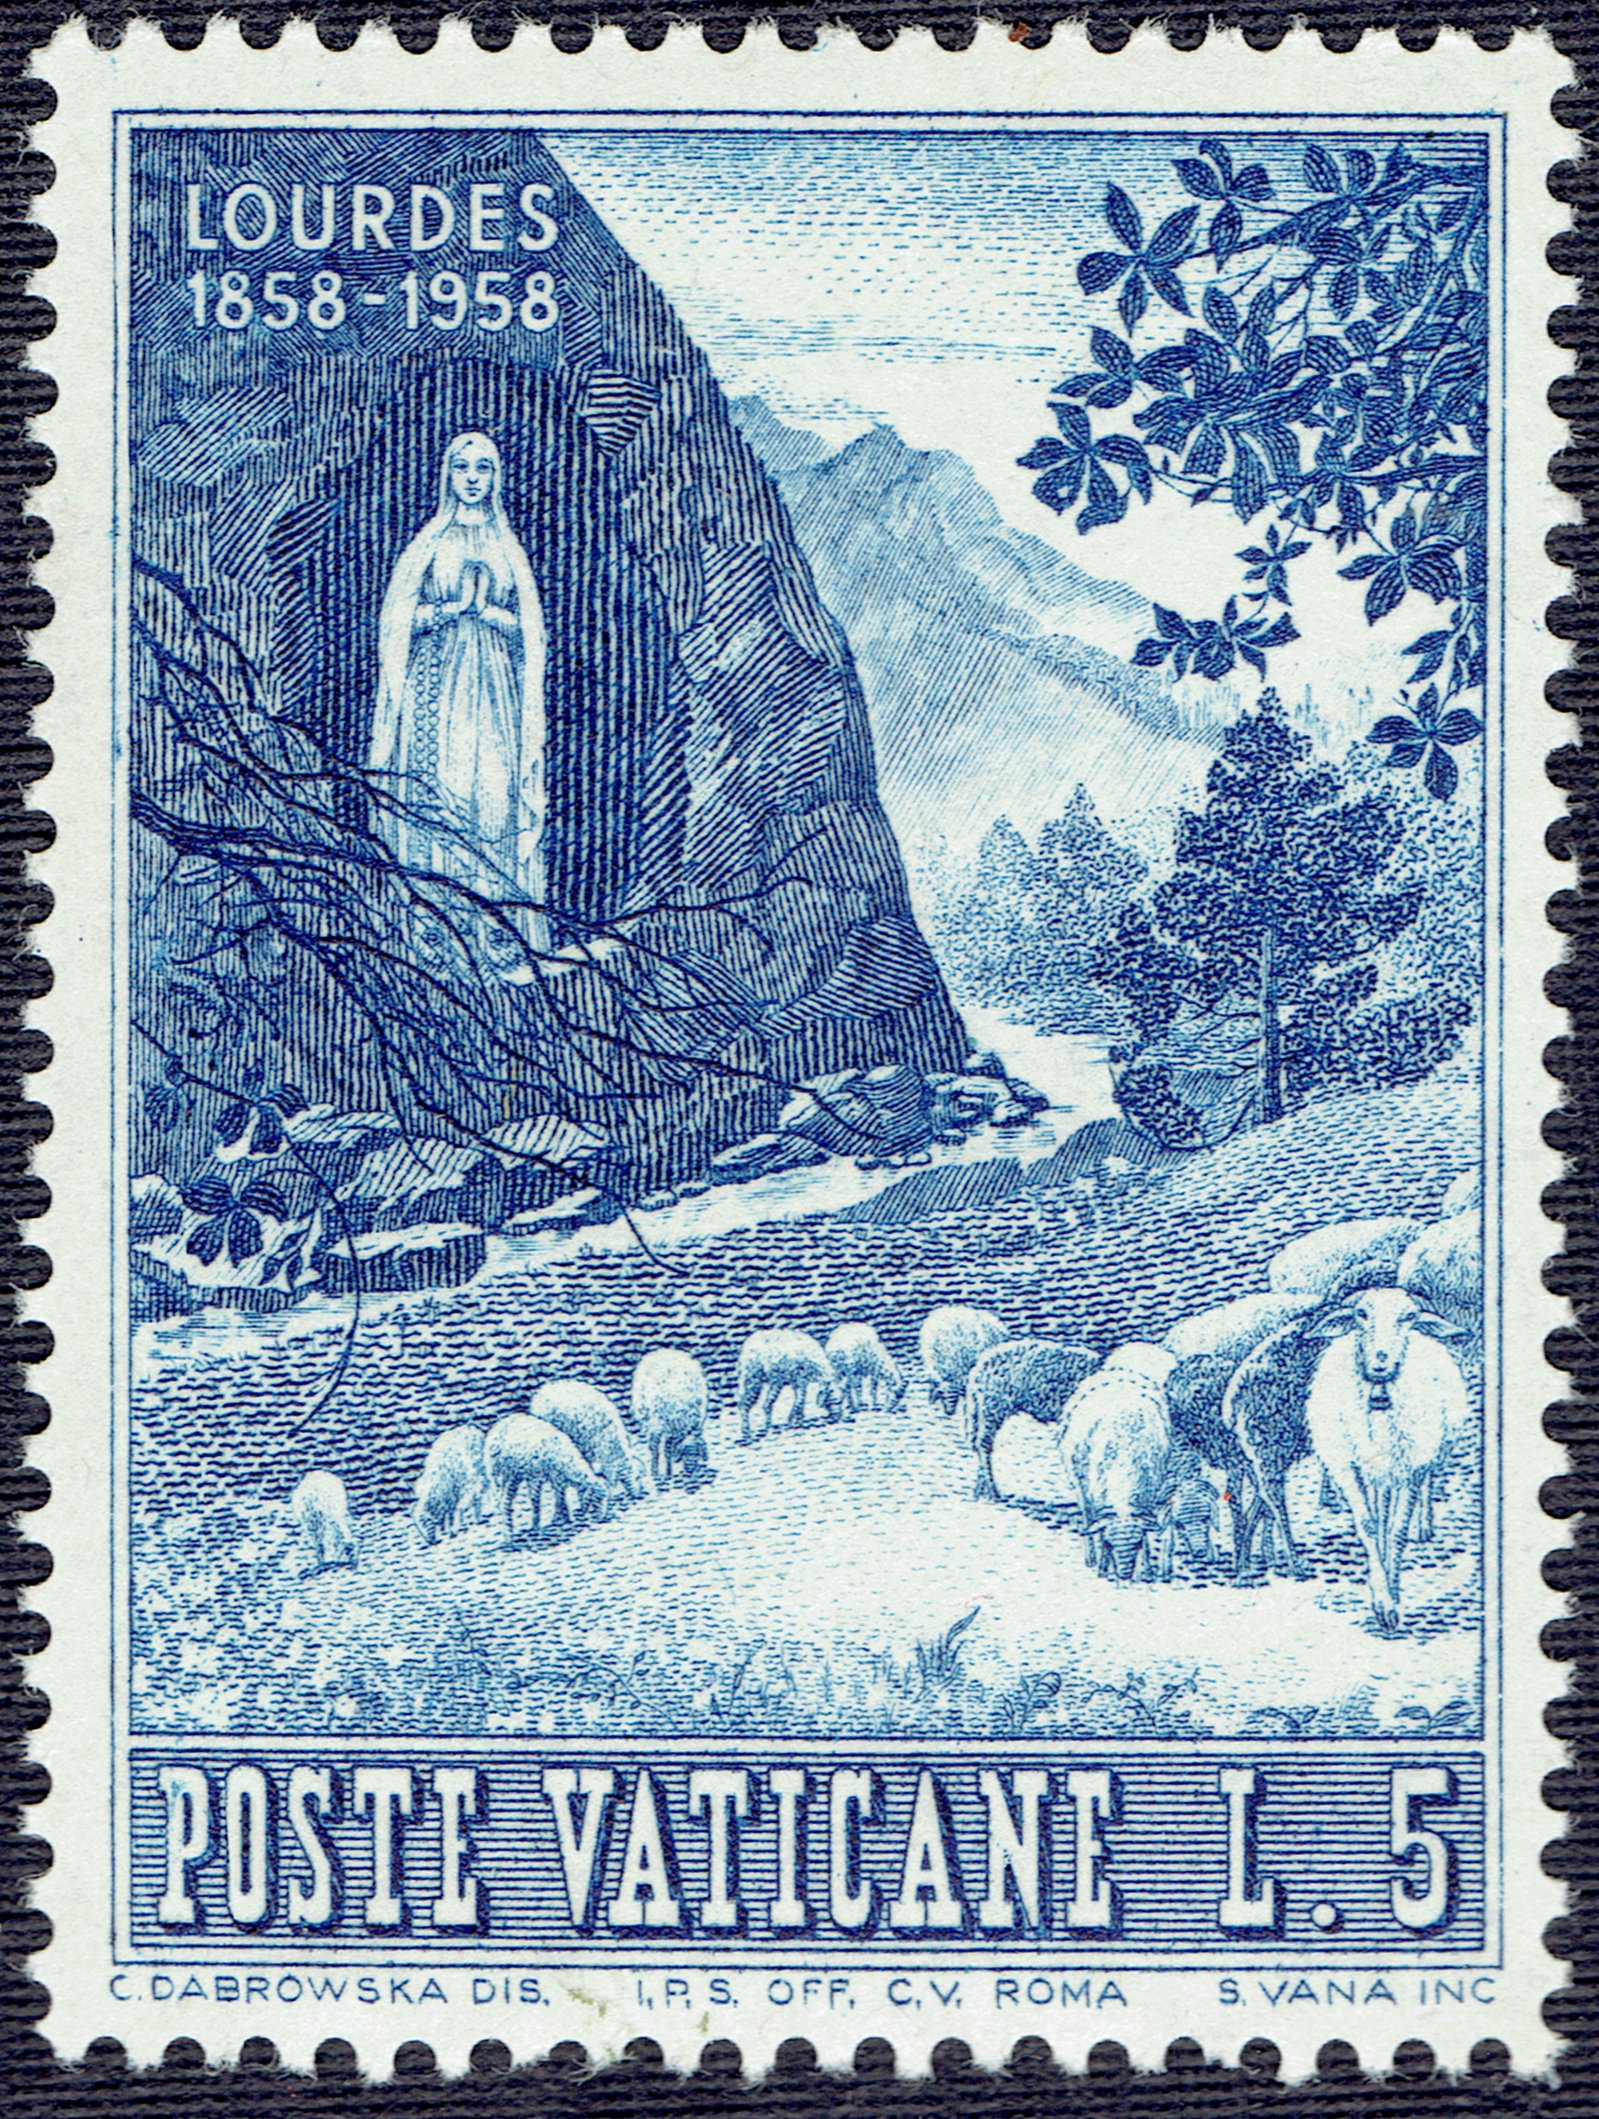 Vatican City - Scott #233 (1958)